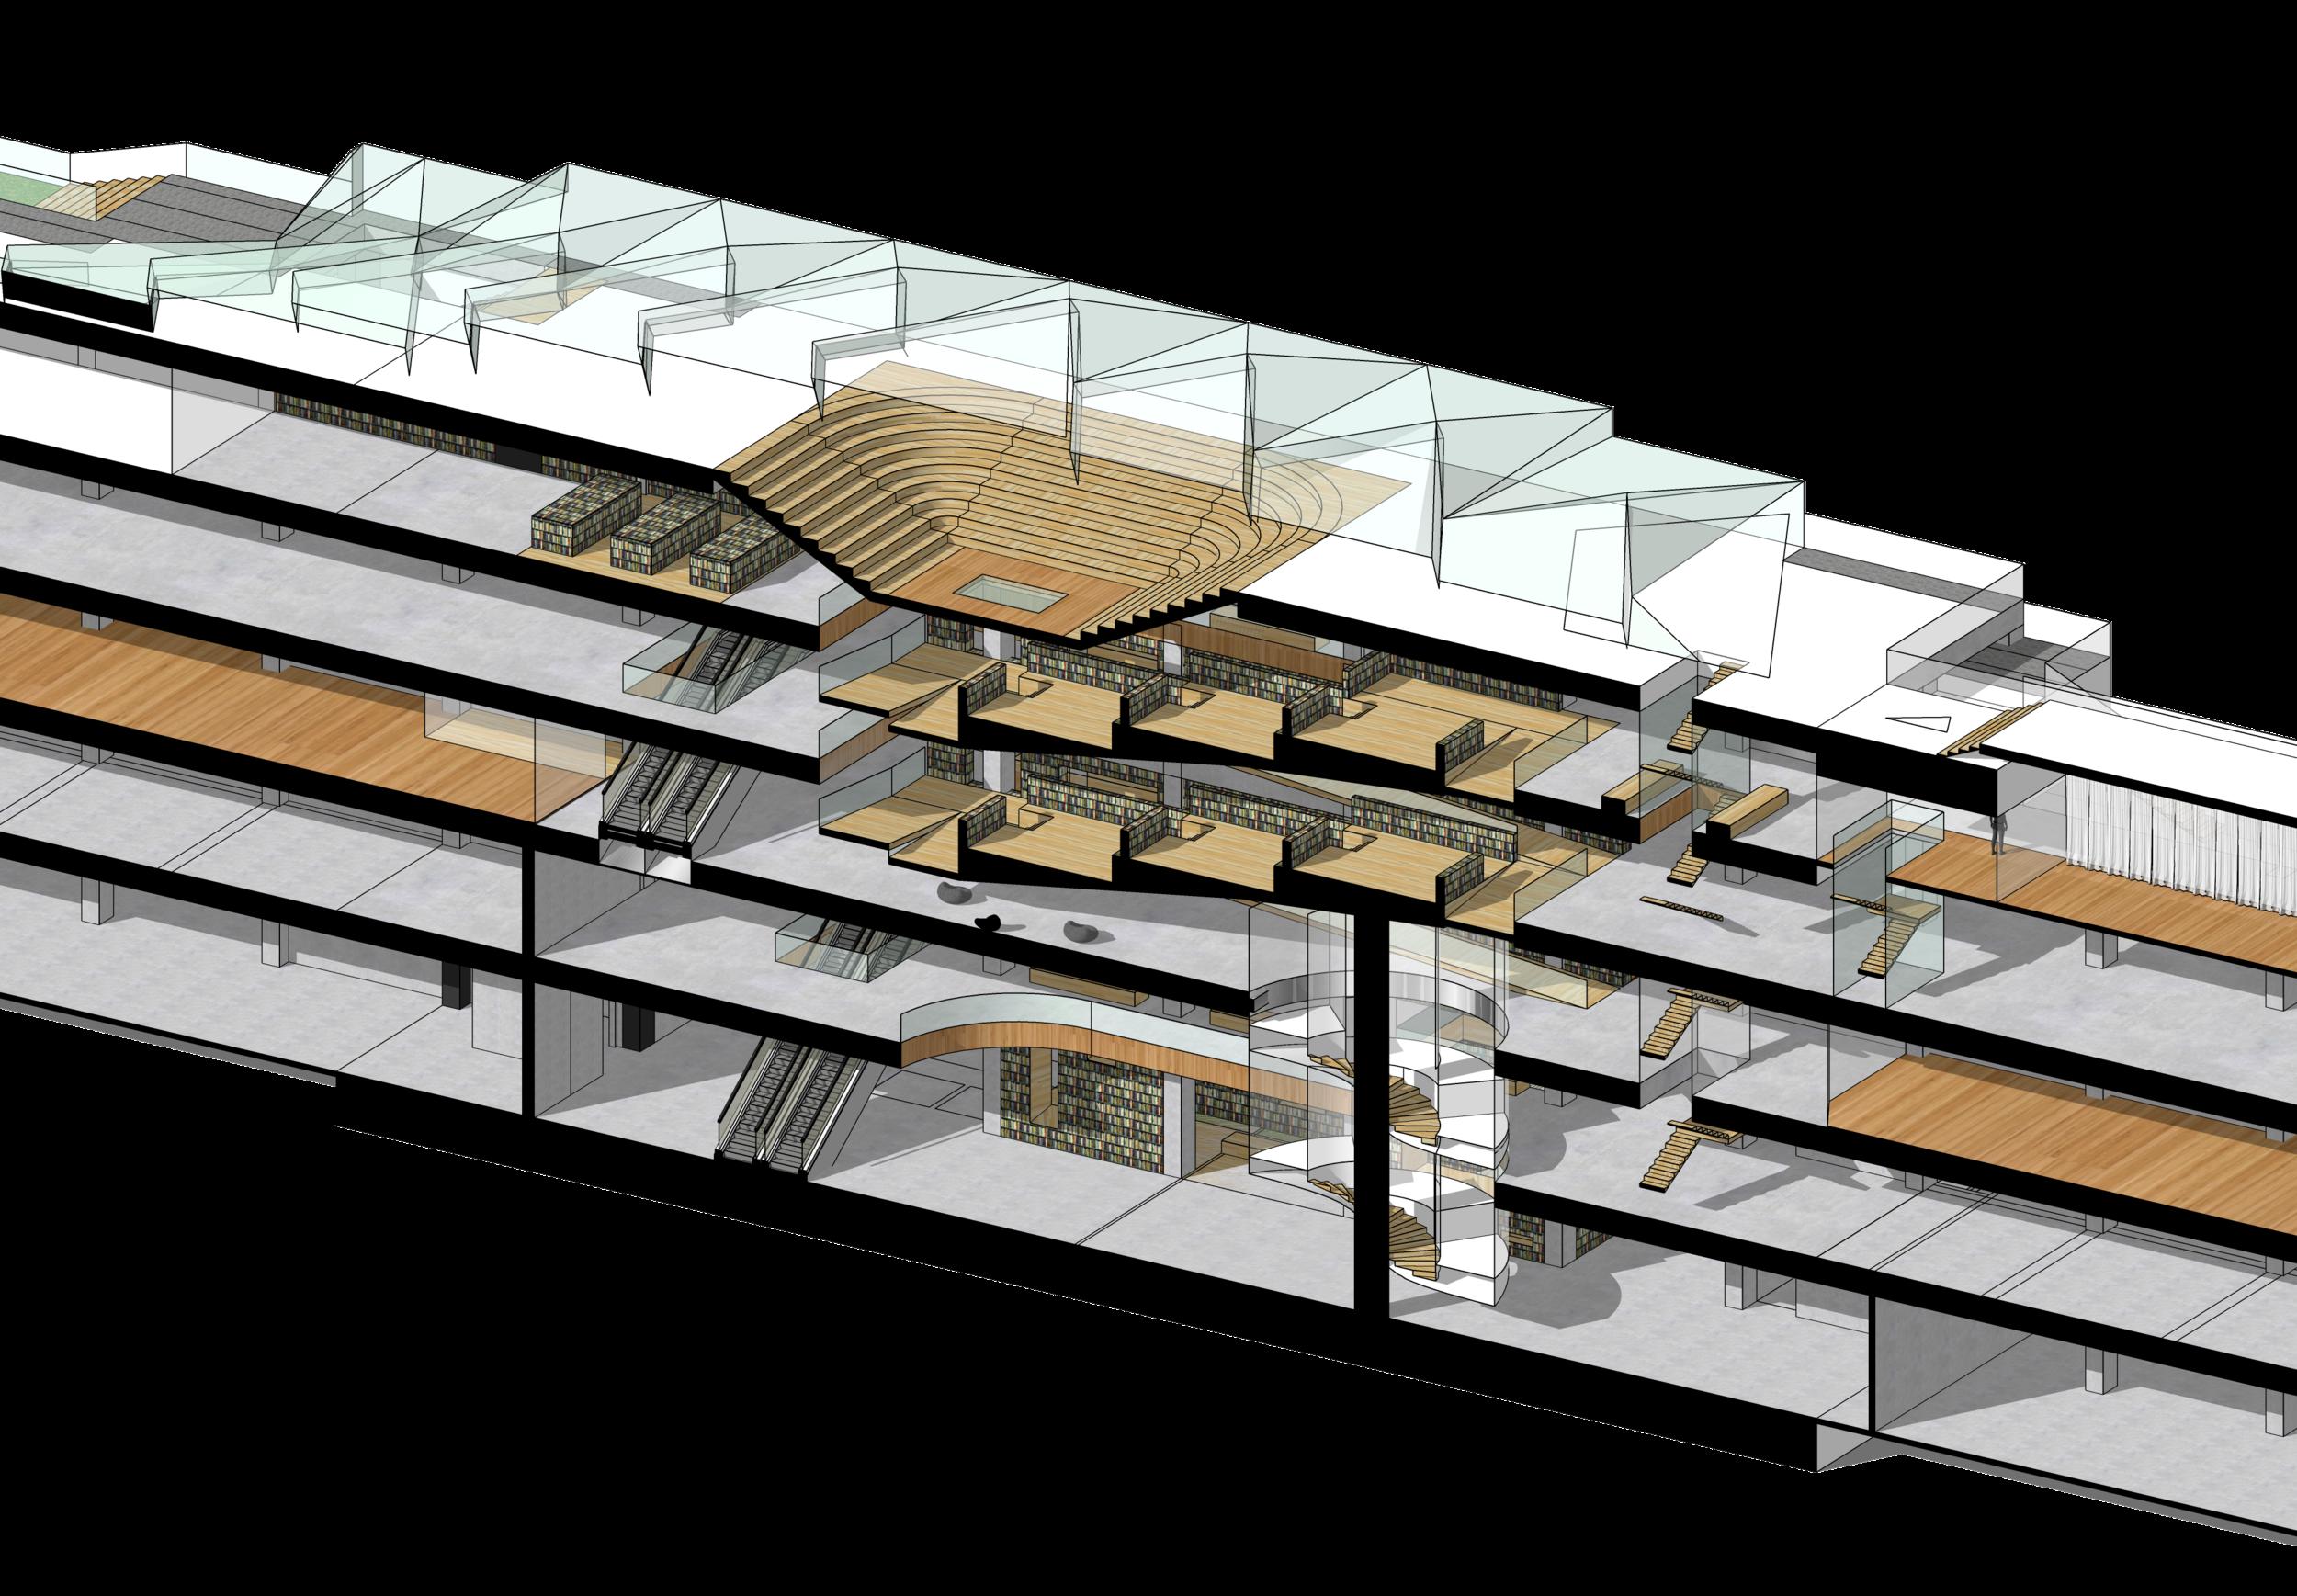 MALL设计模型20190117 office 汇报(西头改动+删除旧视角).png